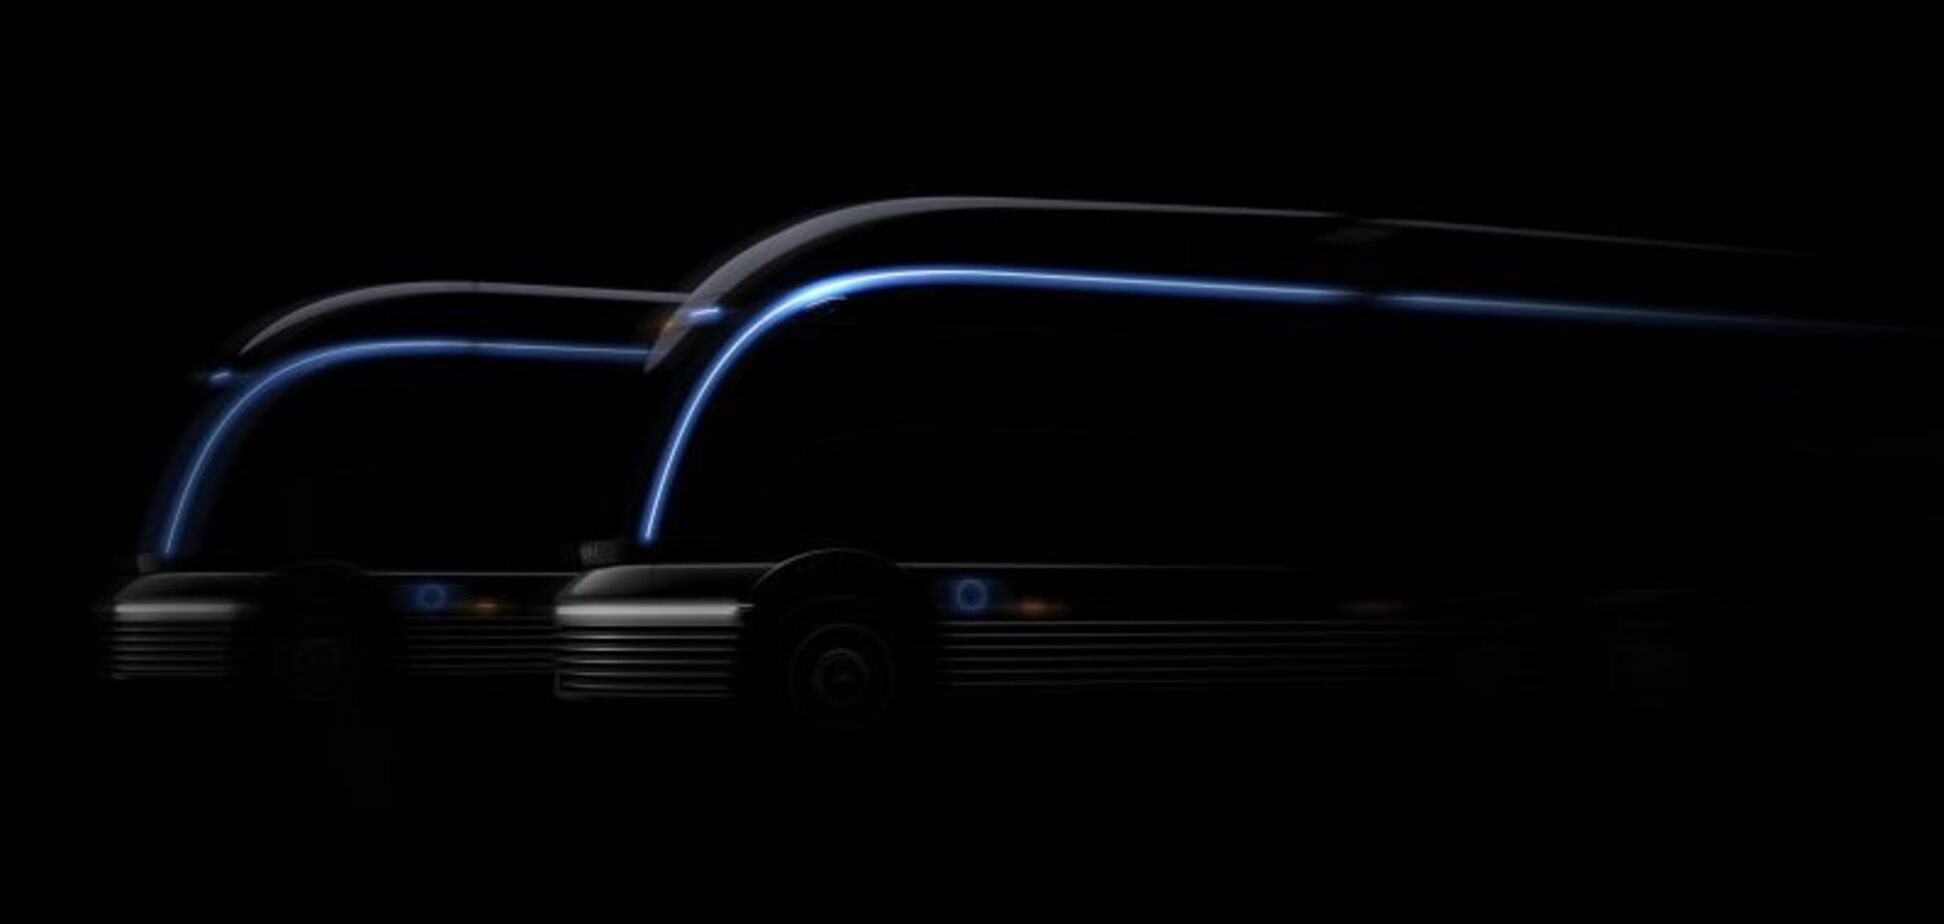 'Штучний інтелект та автономне керування': Hundai показала водневе авто